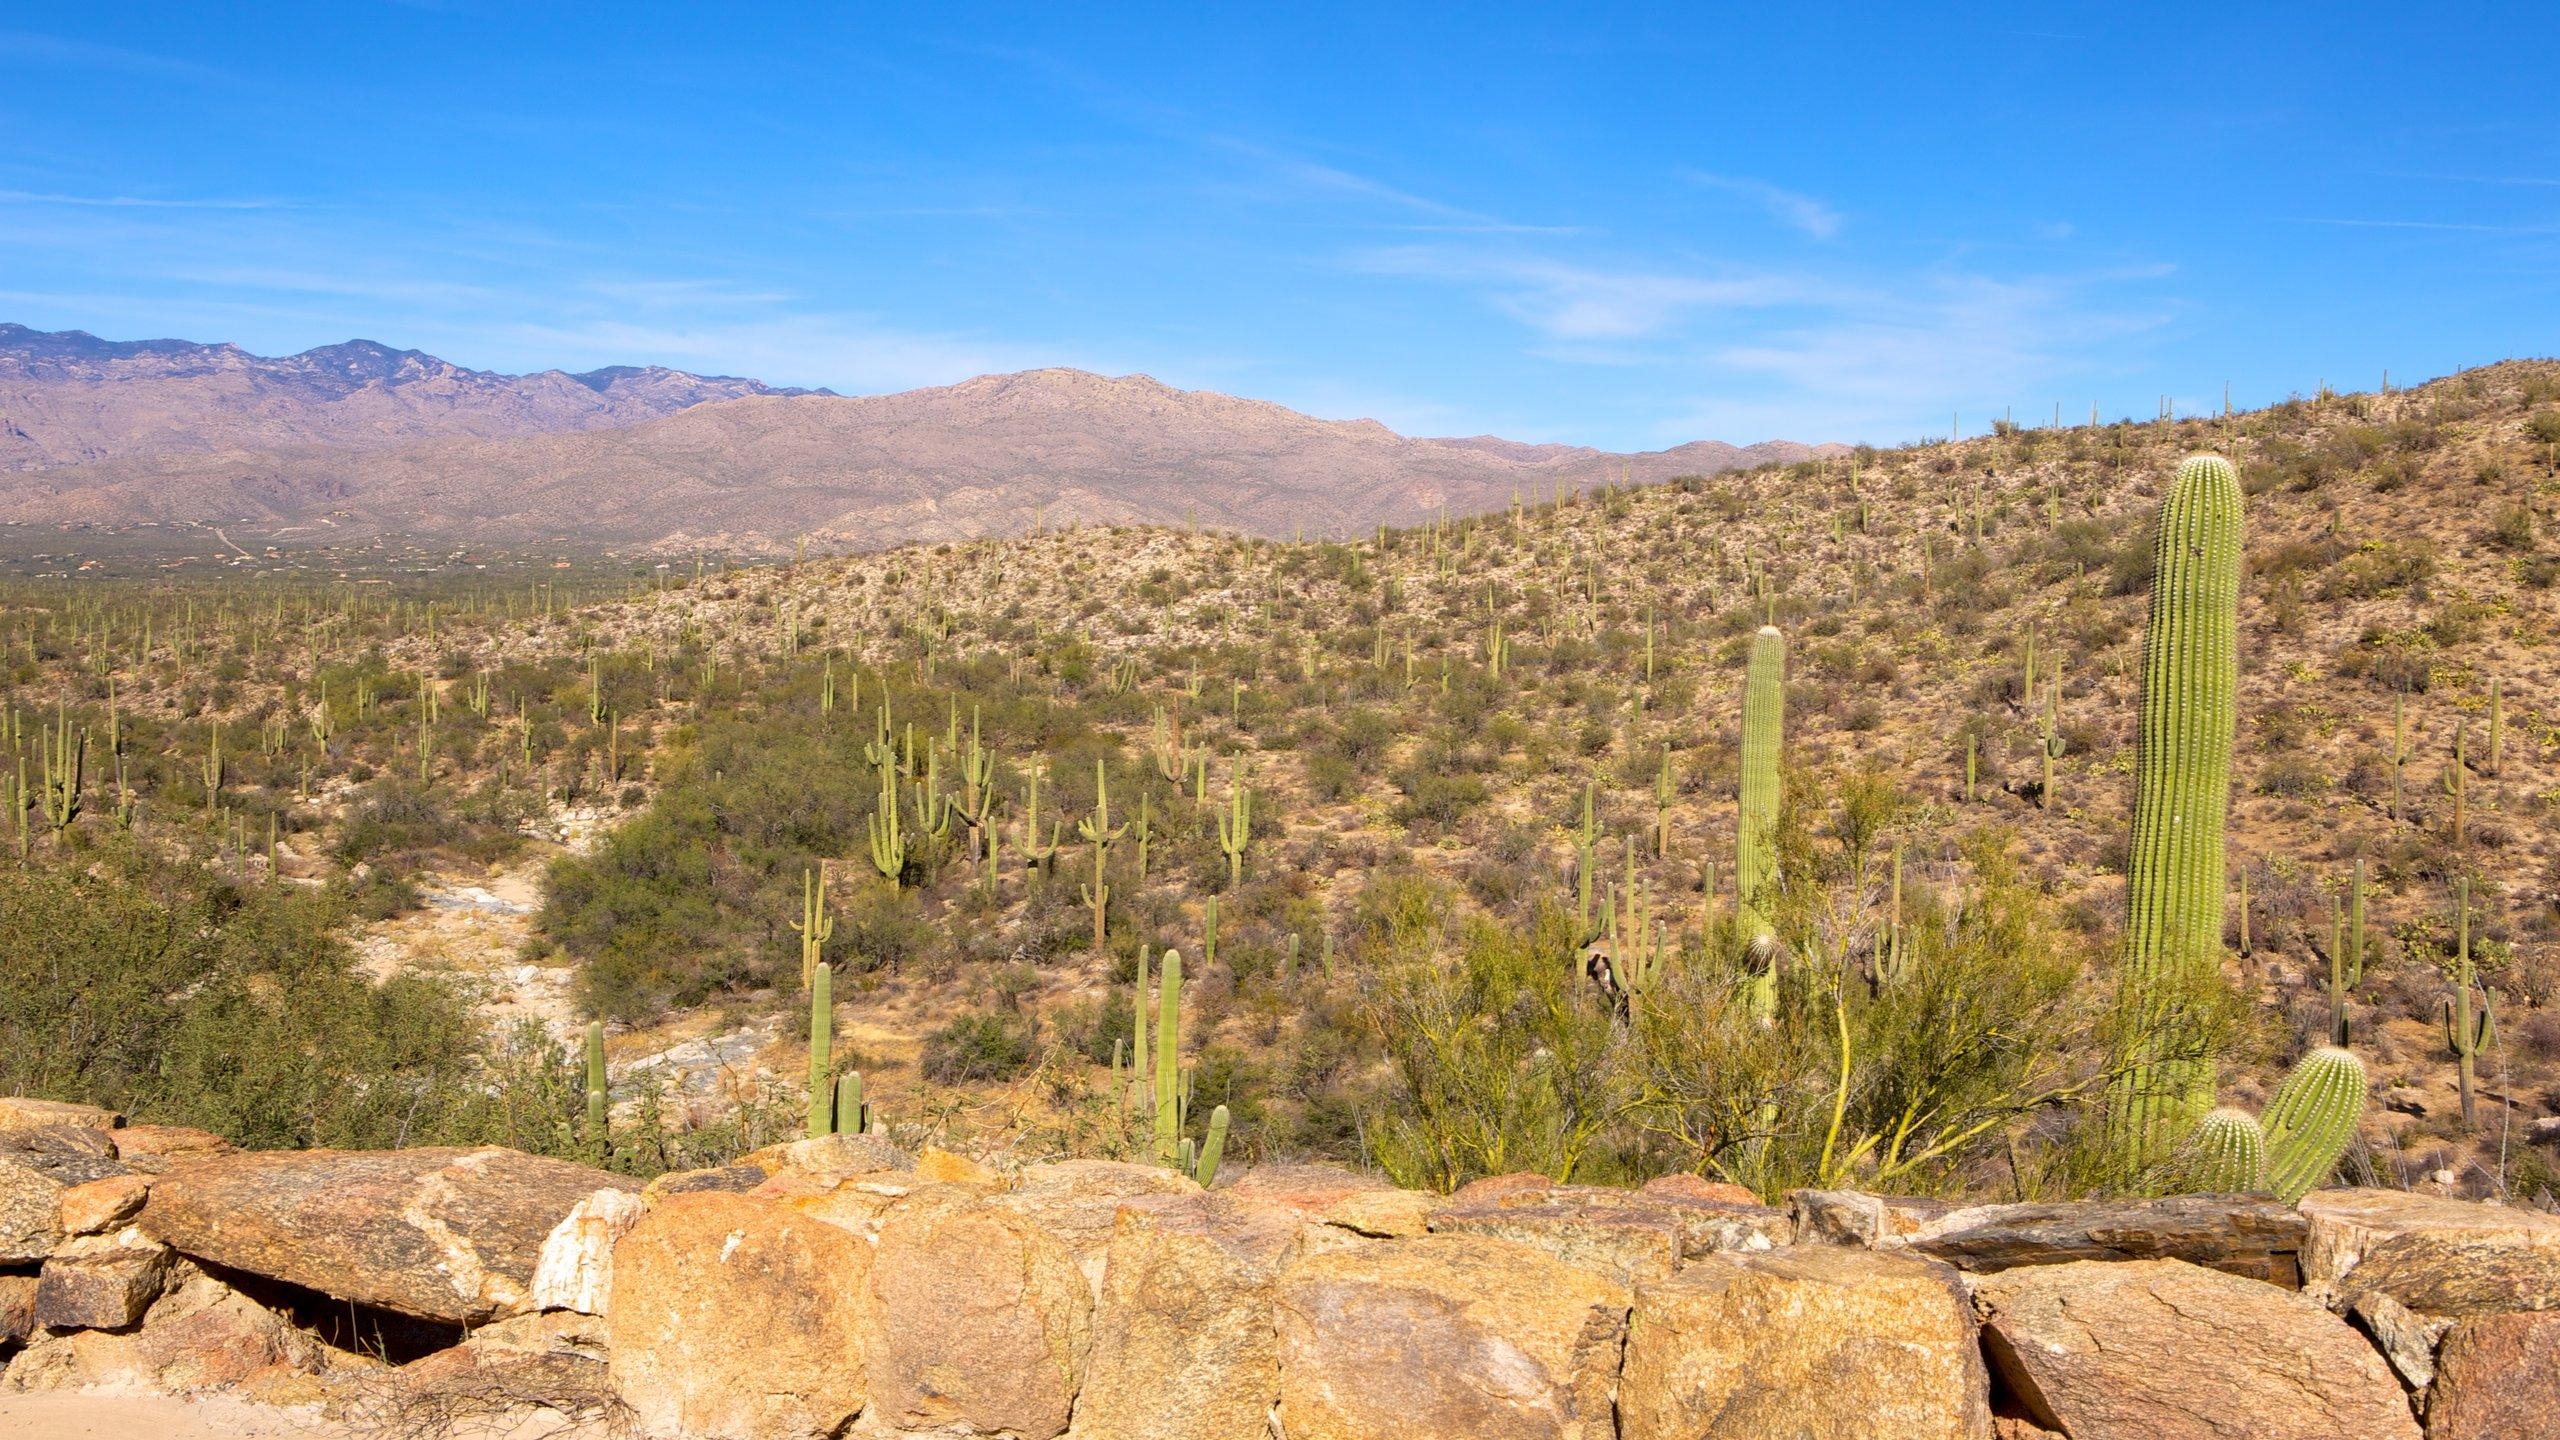 Pima County, Arizona, United States of America